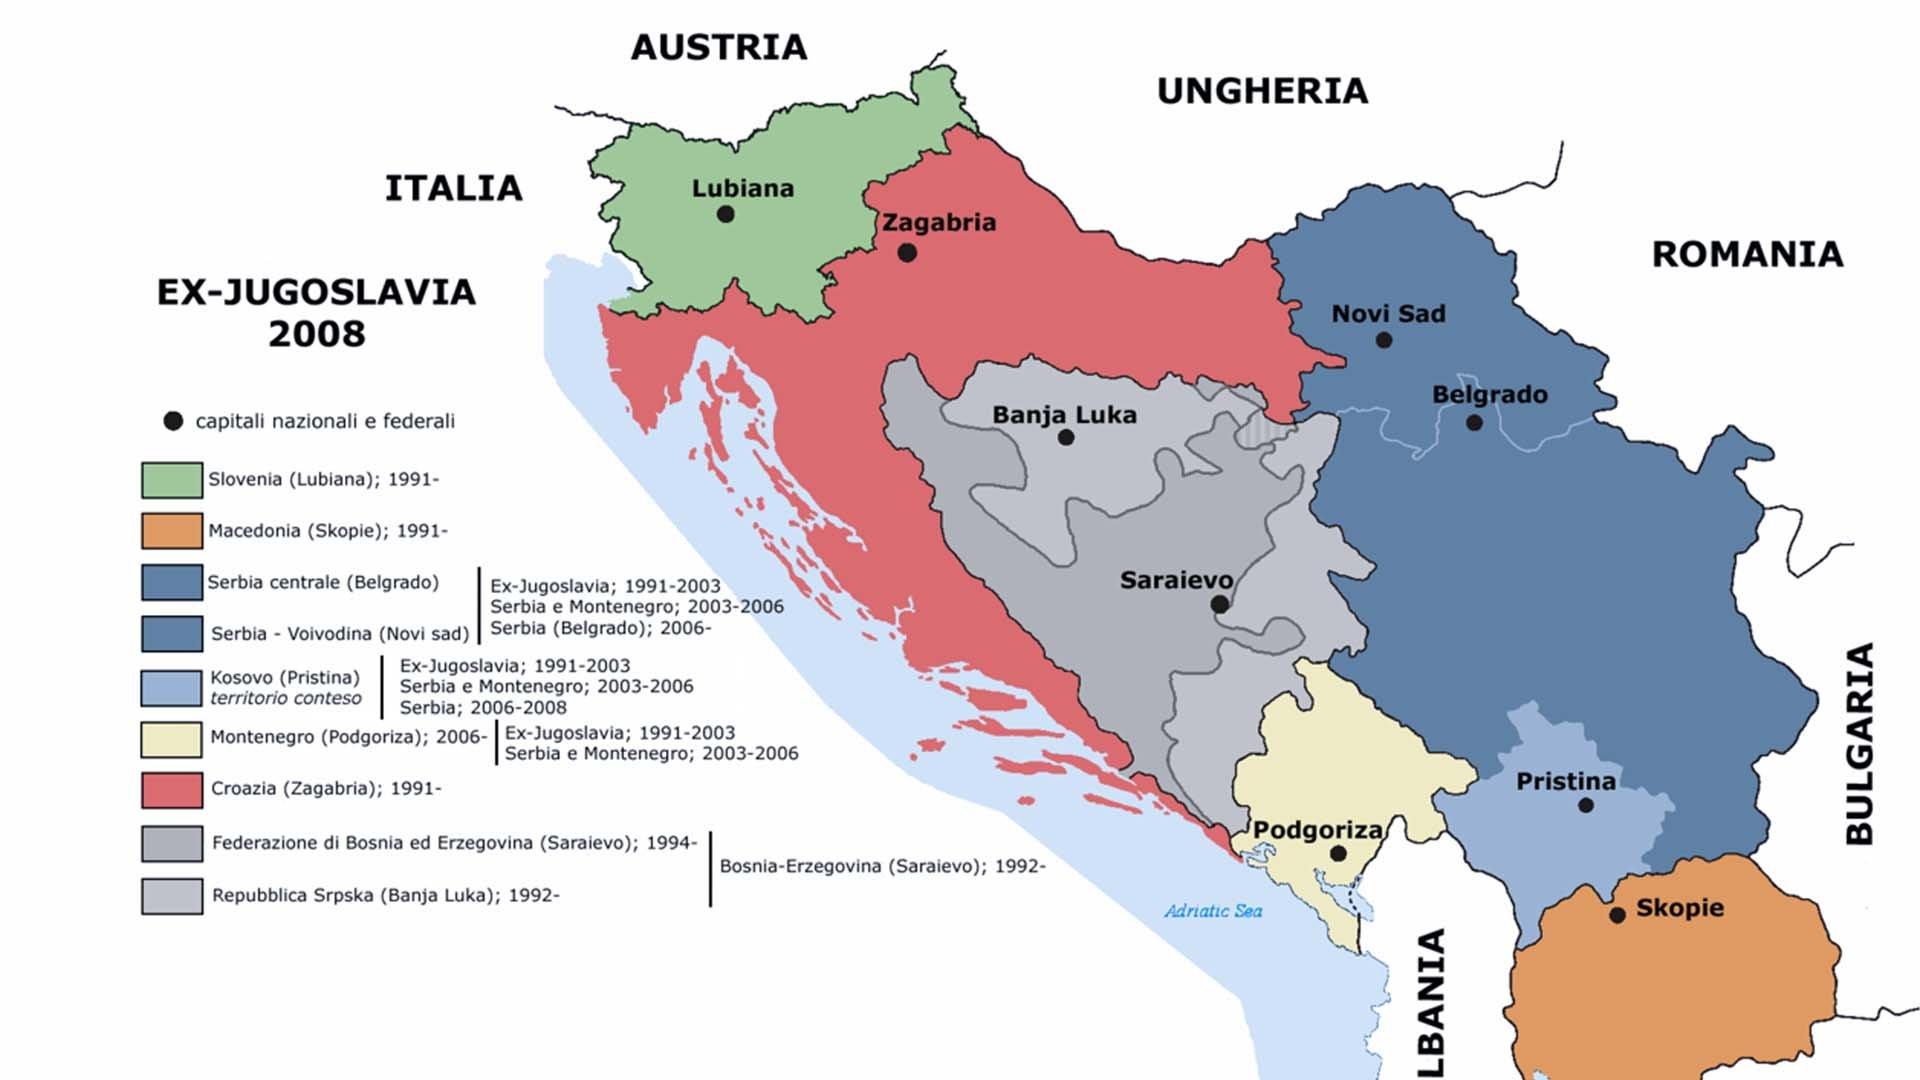 La cartina della Jugoslavia